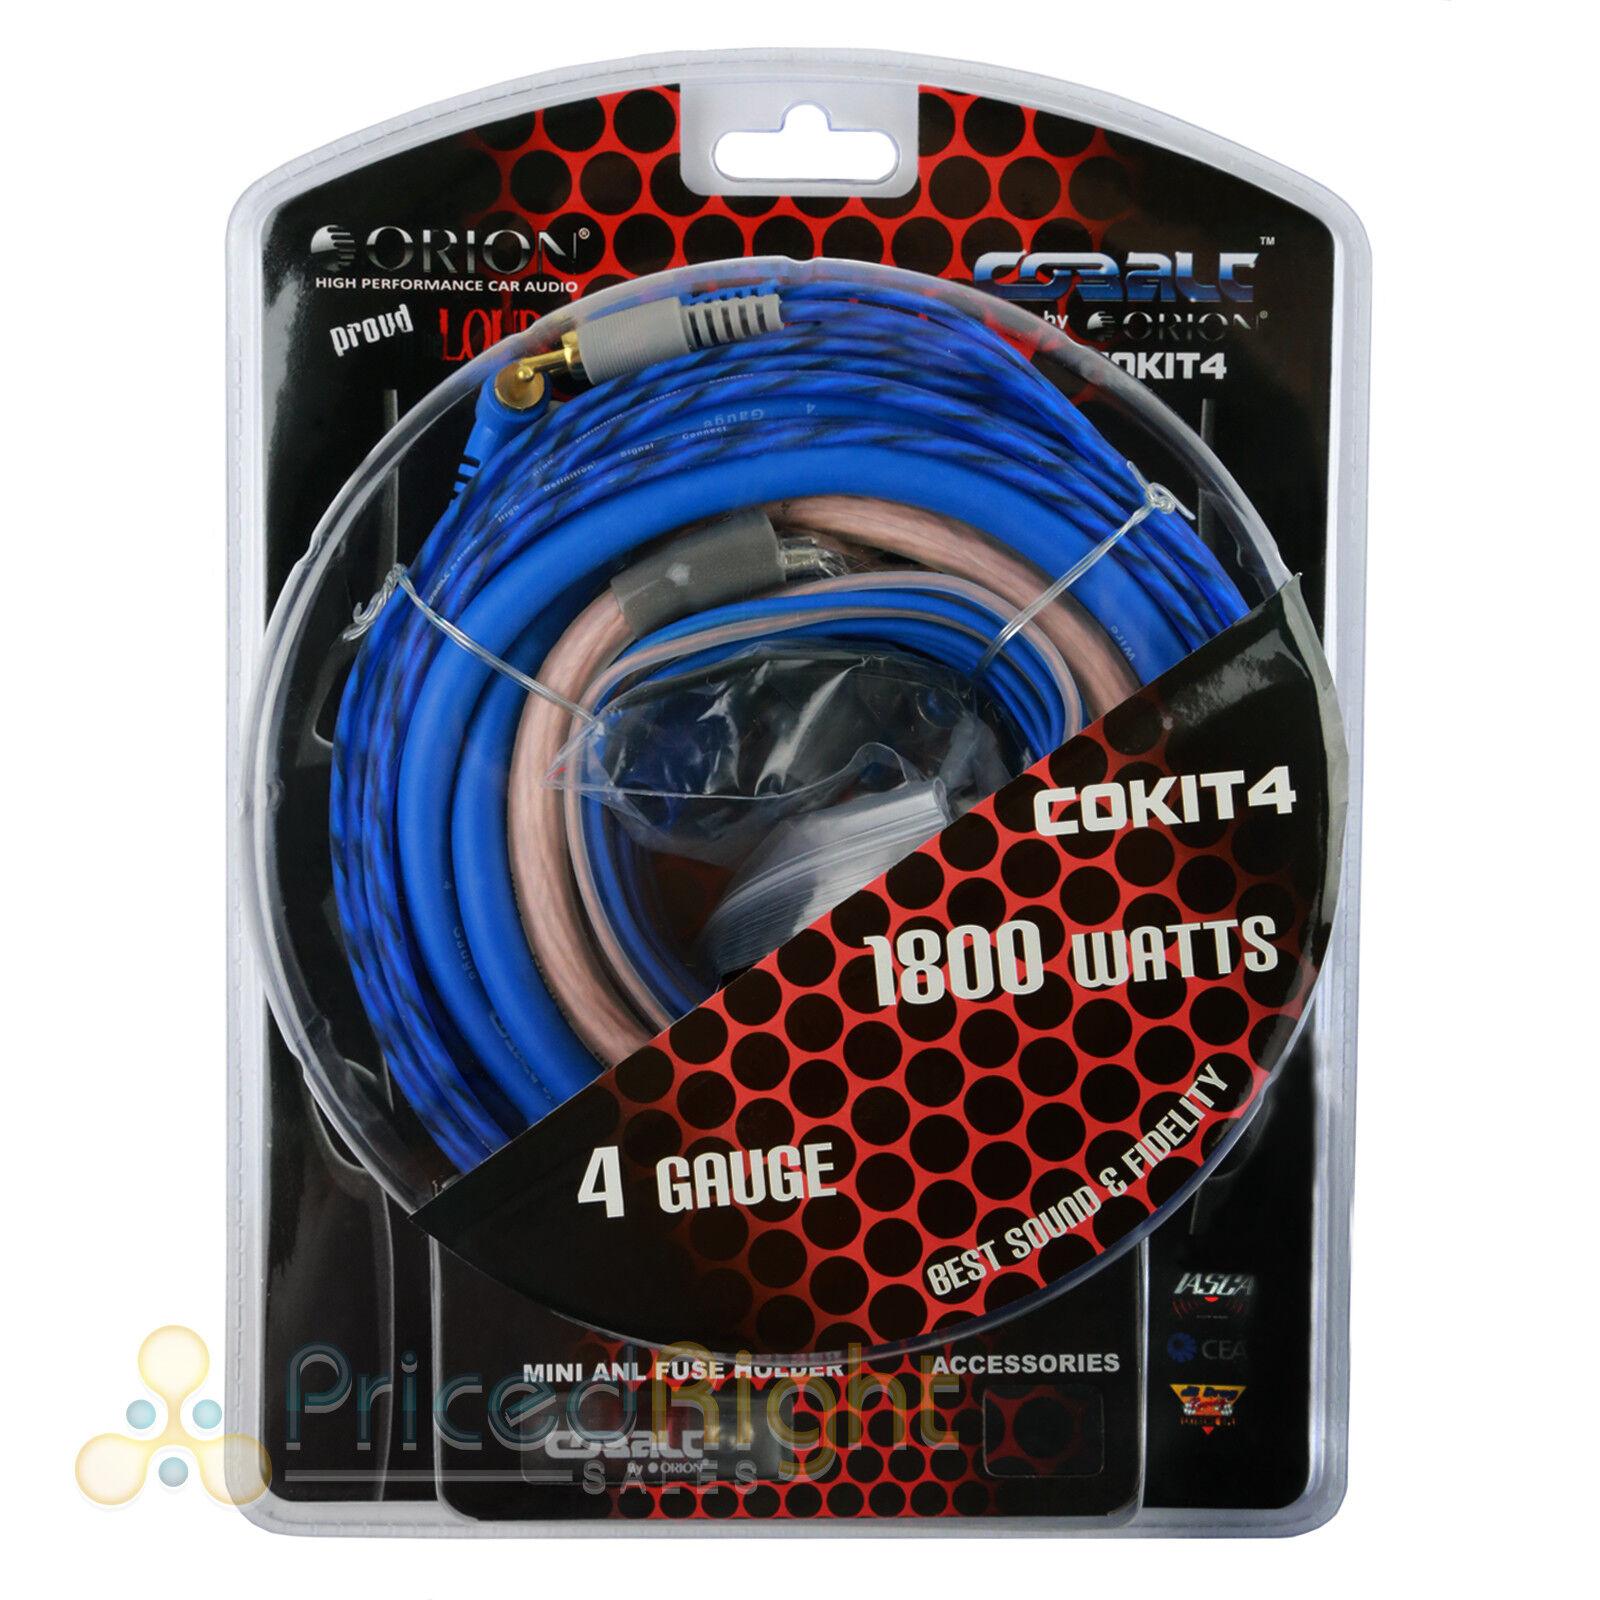 4 Gauge Amp Wiring Kit Reviews Solutions Sound Quest 1000 Watt Wire Darvexcom Cobalt Orion Complete Amplifier Cokit4